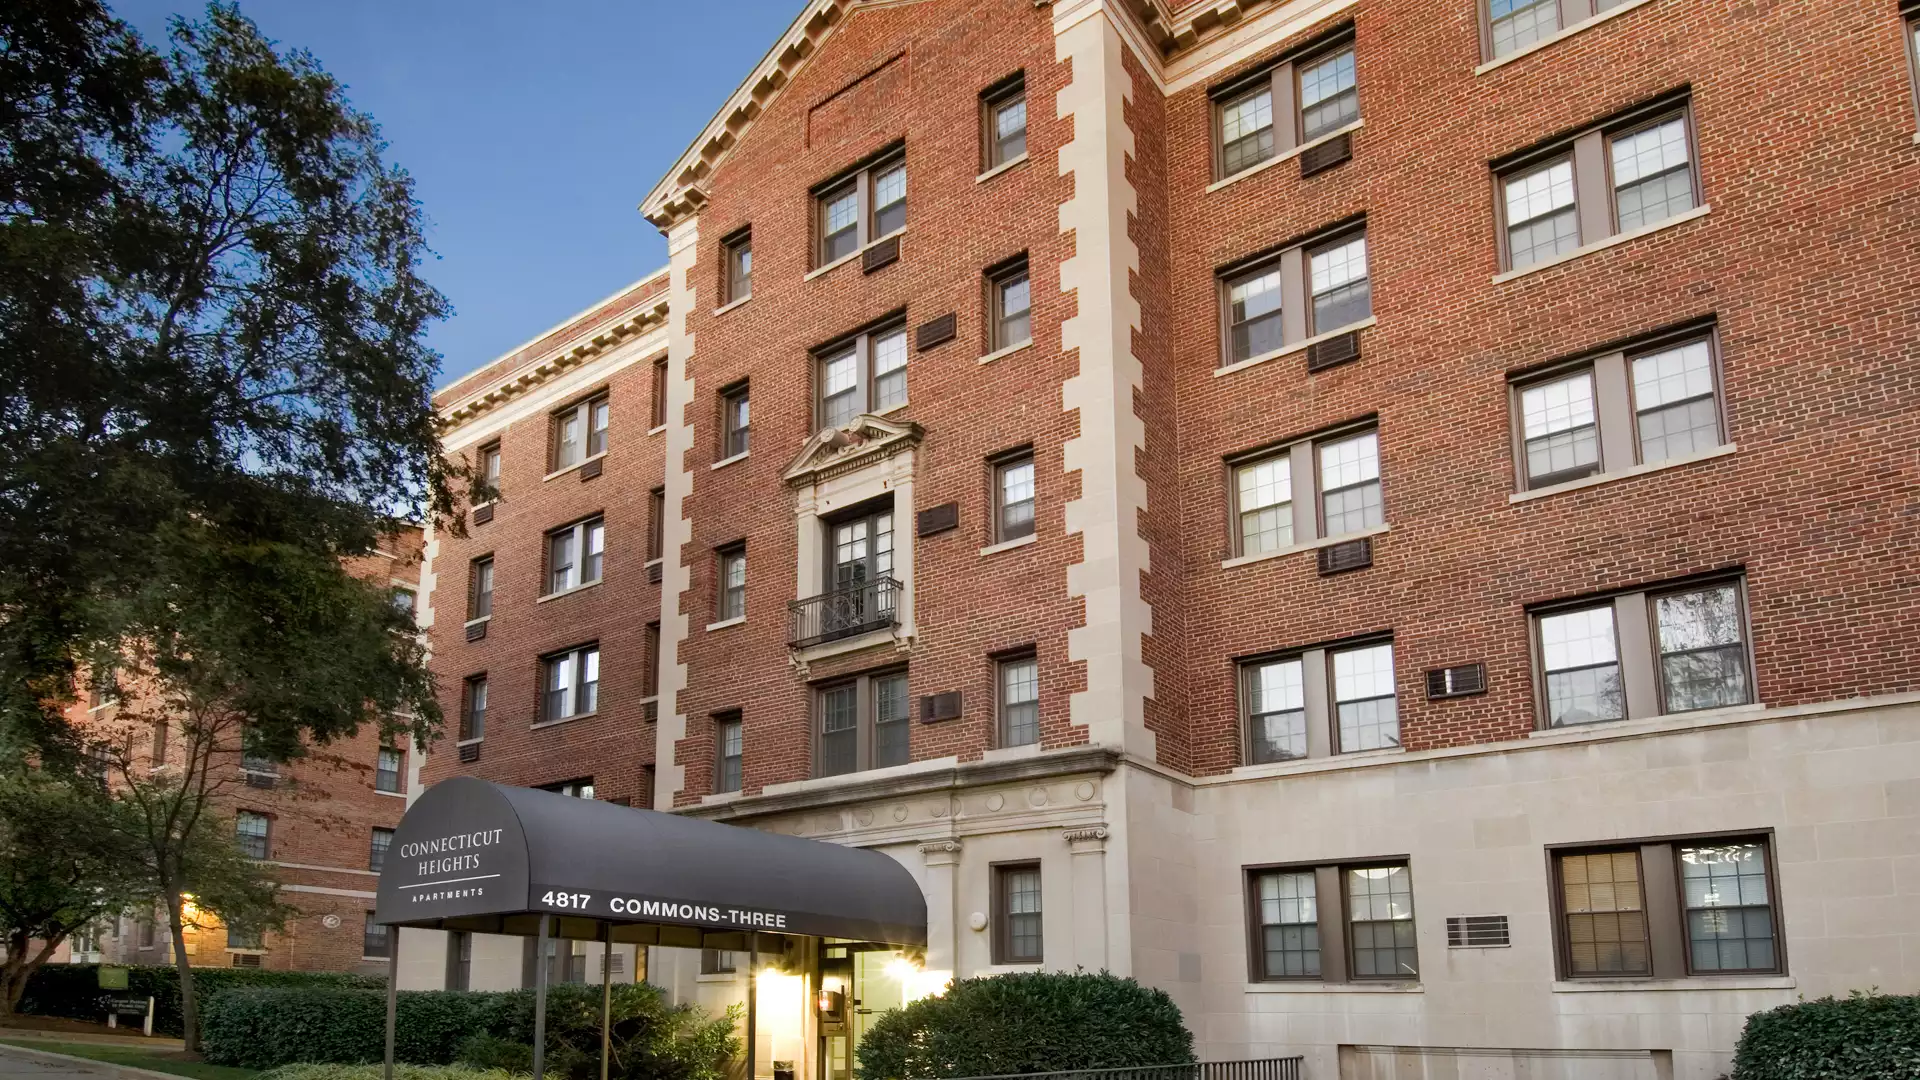 Connecticut Heights Apartments - Washington, DC